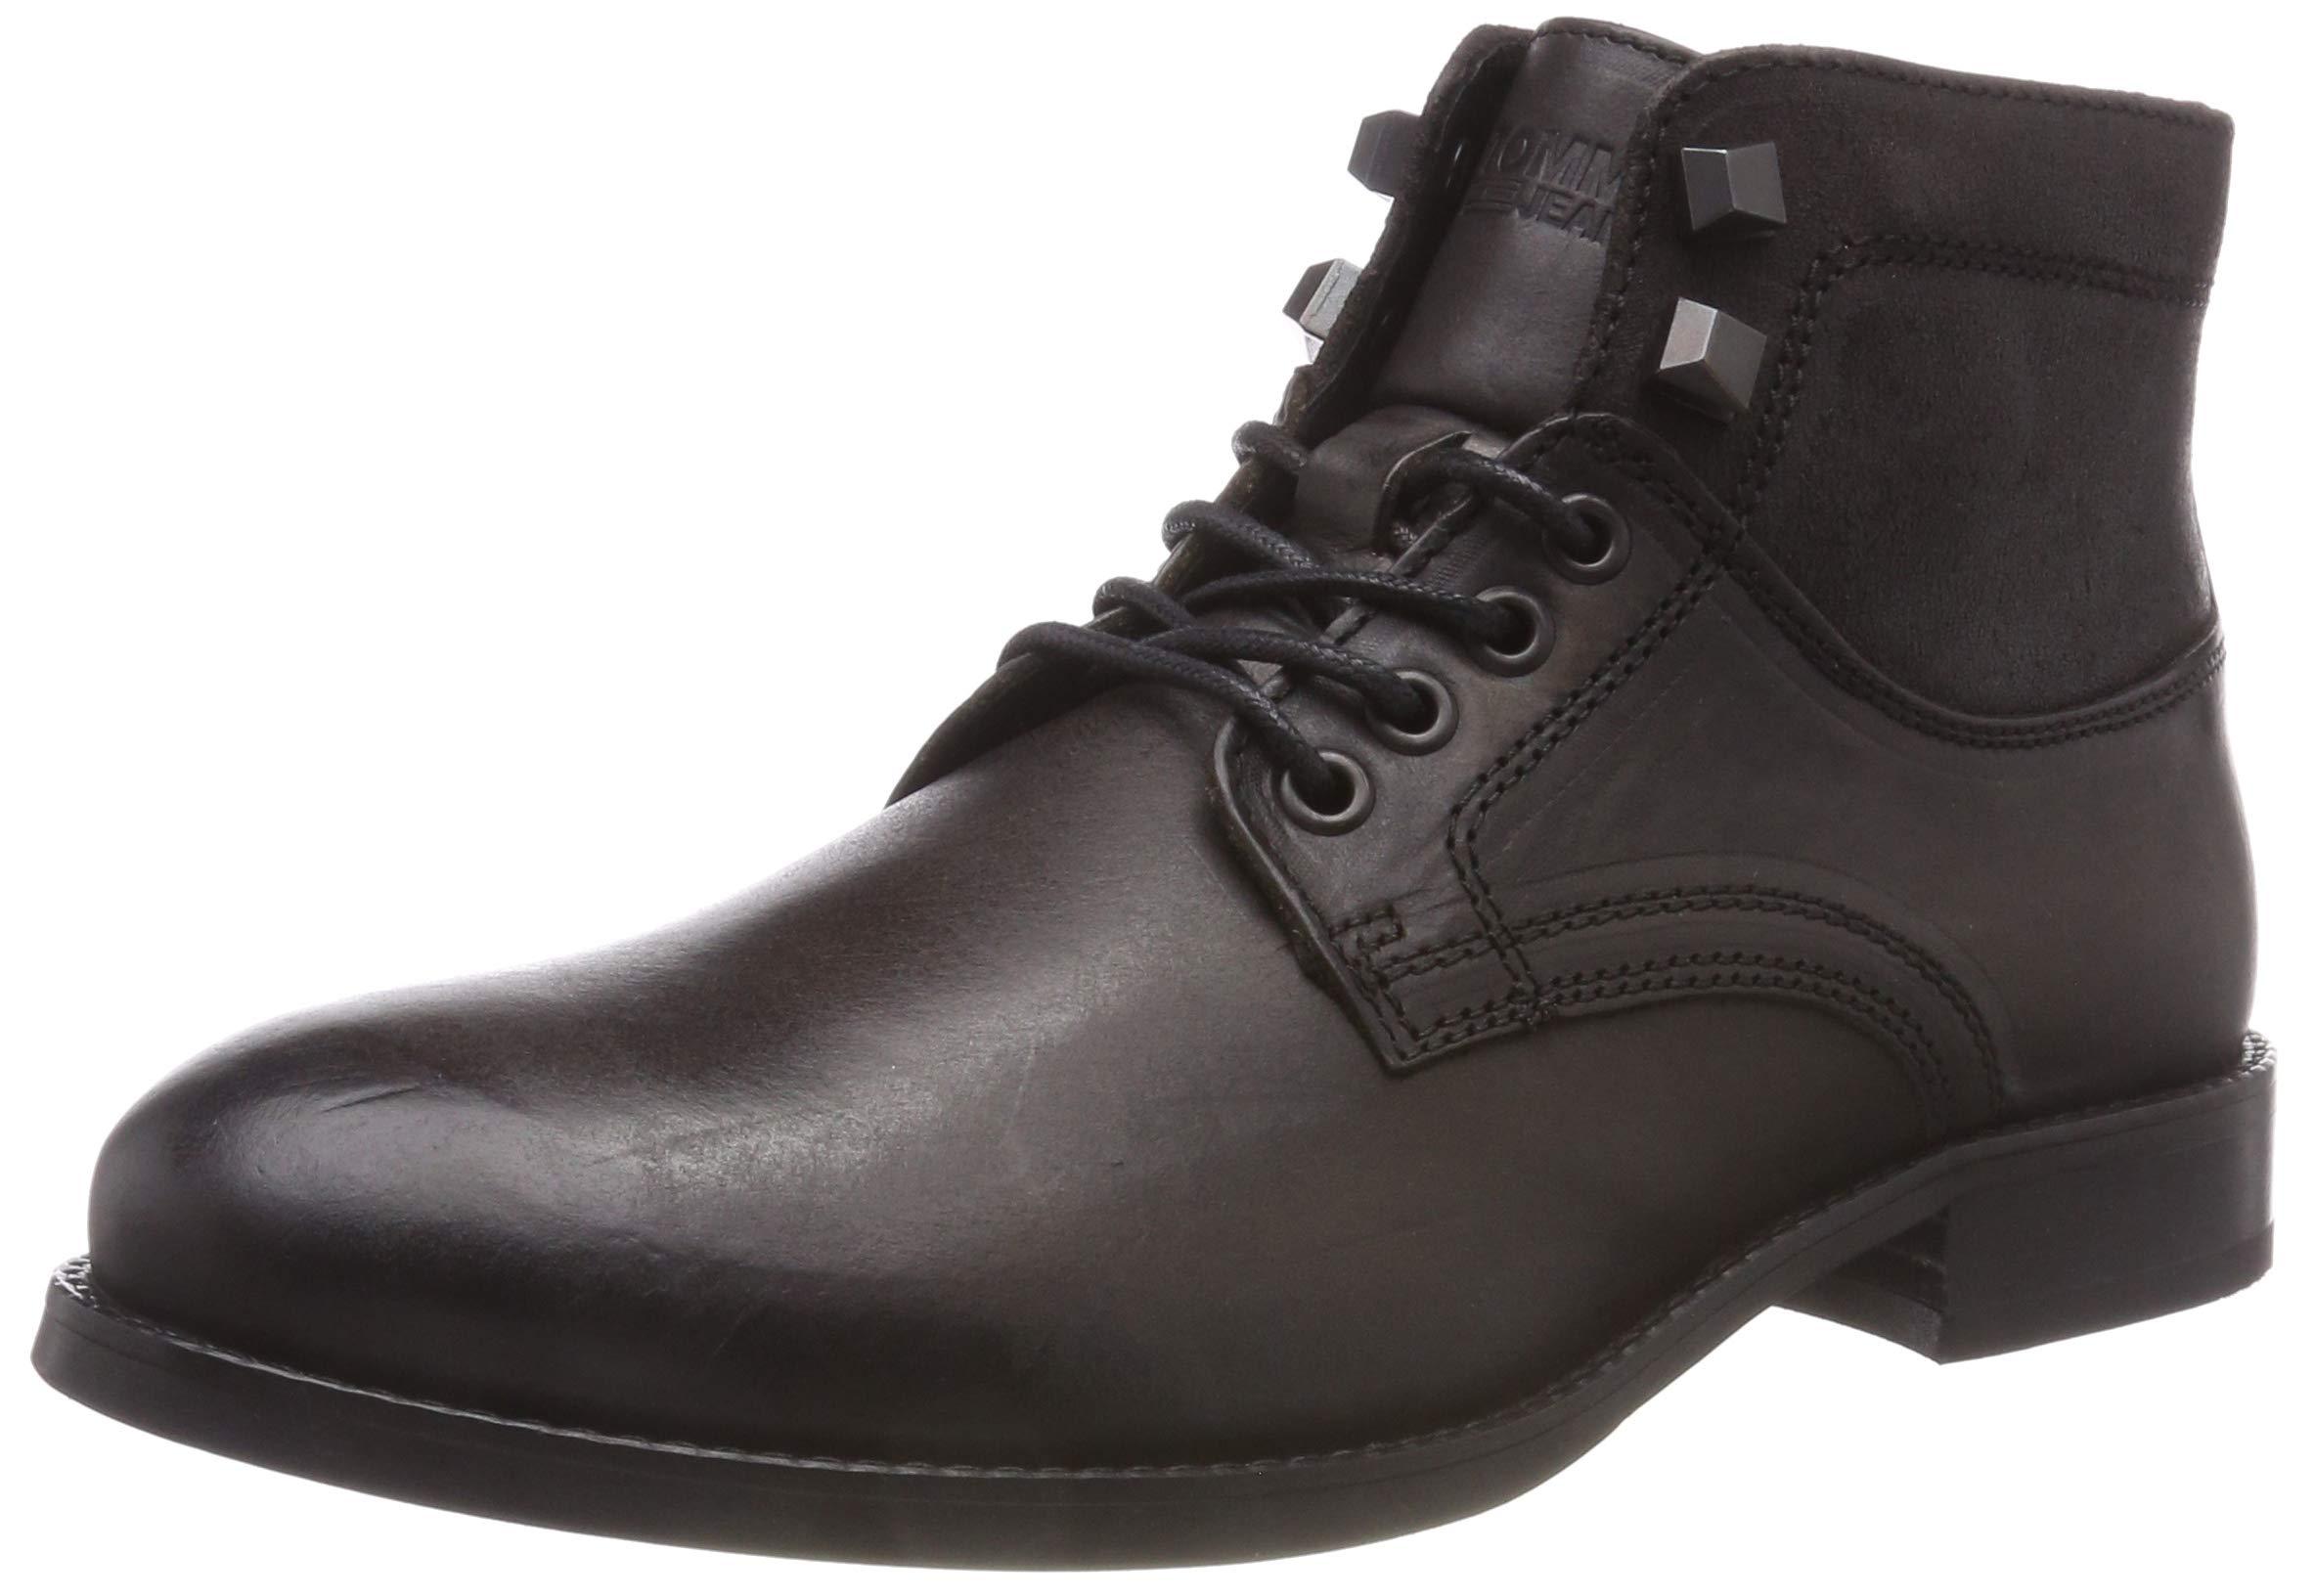 Tommy 02843 Hilfiger Denim Eu Jeans BootDesert Shadow Casual Leather HommeMarrondark 7fYb6gyv